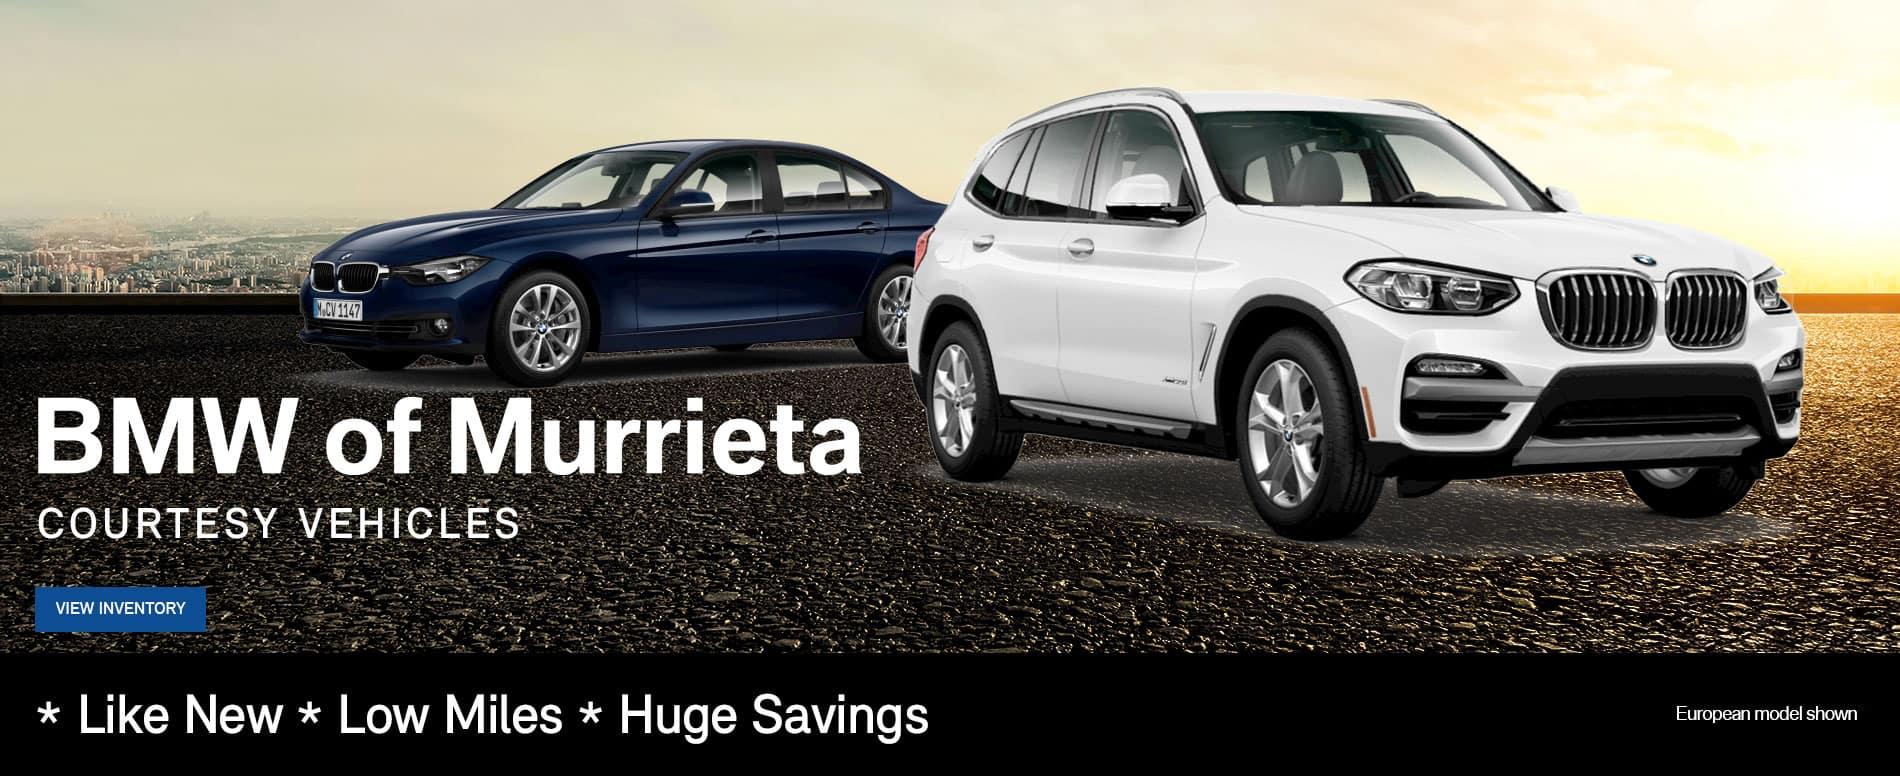 BMW-of-Murrieta